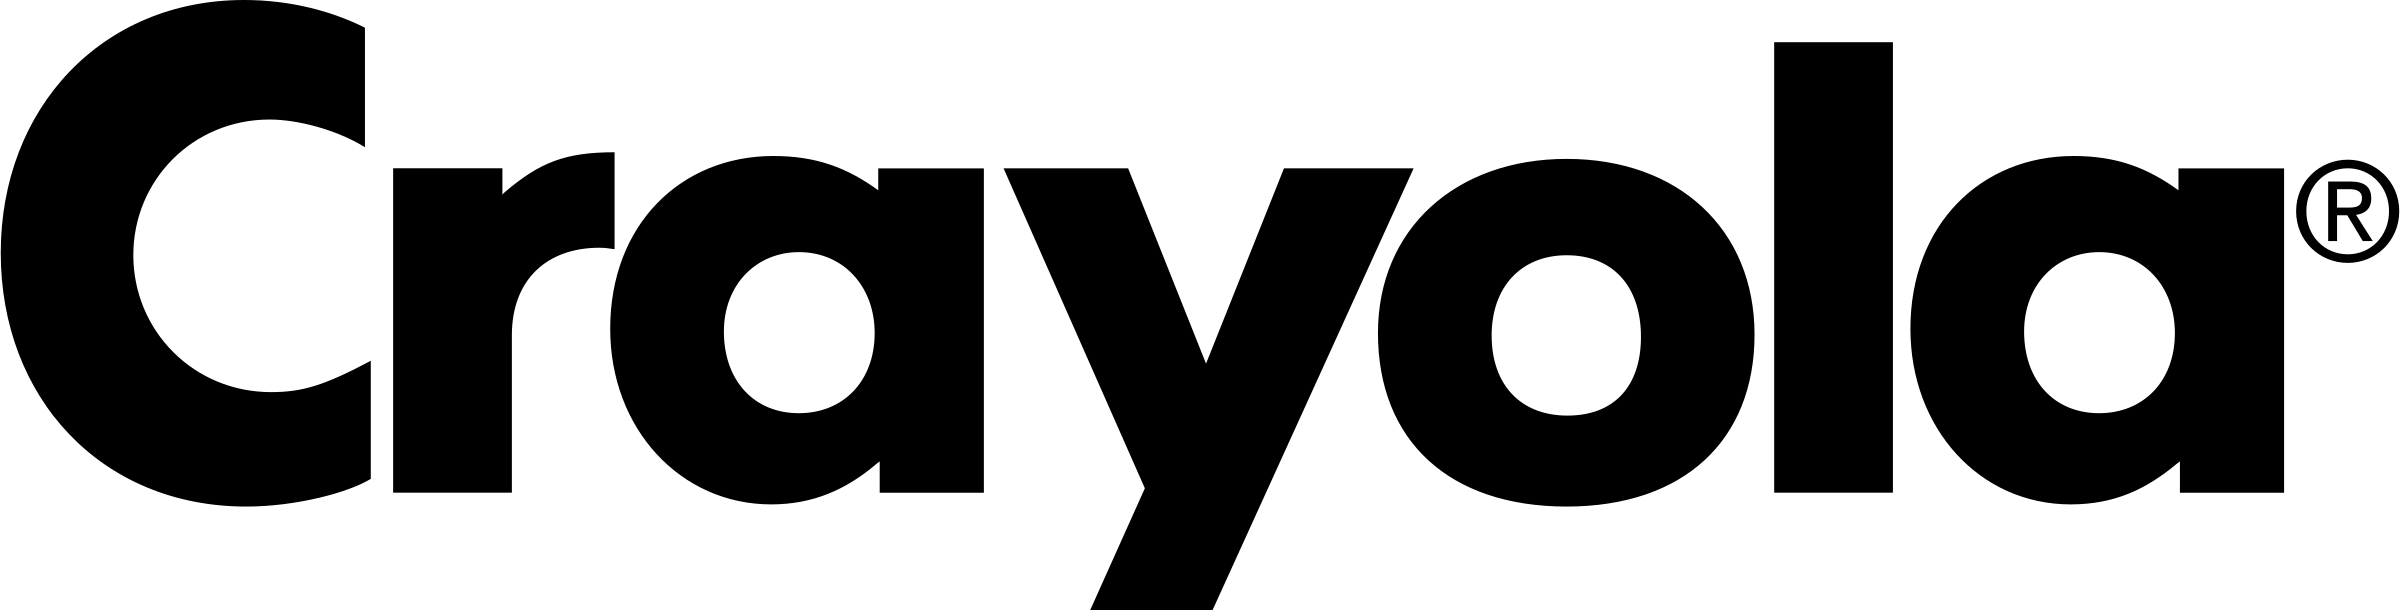 Crayola Logo PNG Transparent & SVG Vector - Freebie Supply